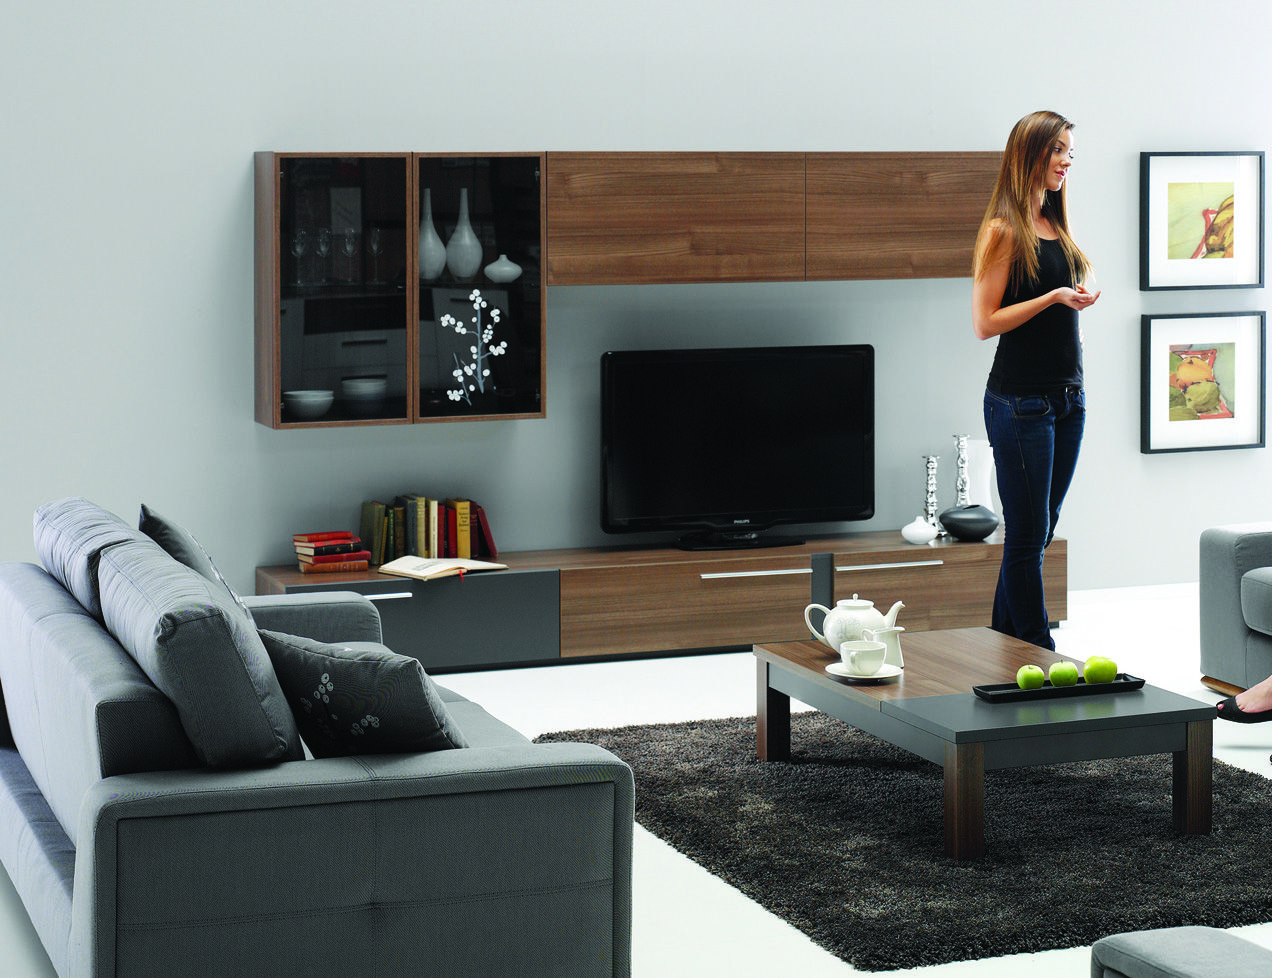 Modern yeni tv unite modelleri 7 - Enjoy Duvar Nitesi Http Balevim Com Tr Tv Uniteleri Televizyon Sehpalar Deri Televizyon Niteleri Modern Televizyon Niteleri Avangarde Tel